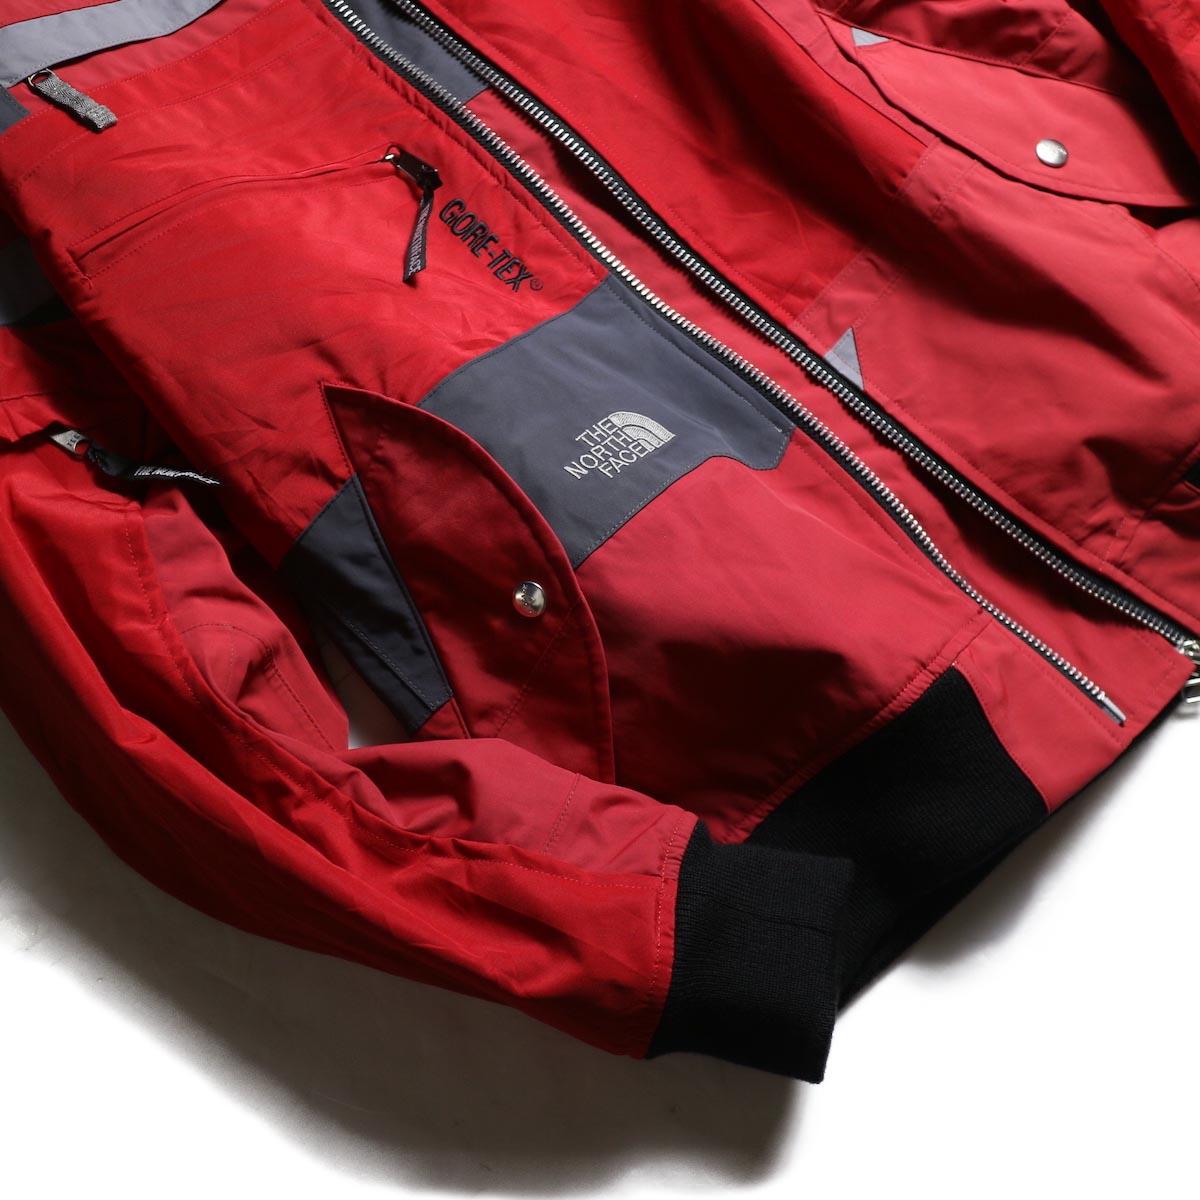 OLD PARK / Flight Jacket (OUTDOOR)(Lsize) ポケット